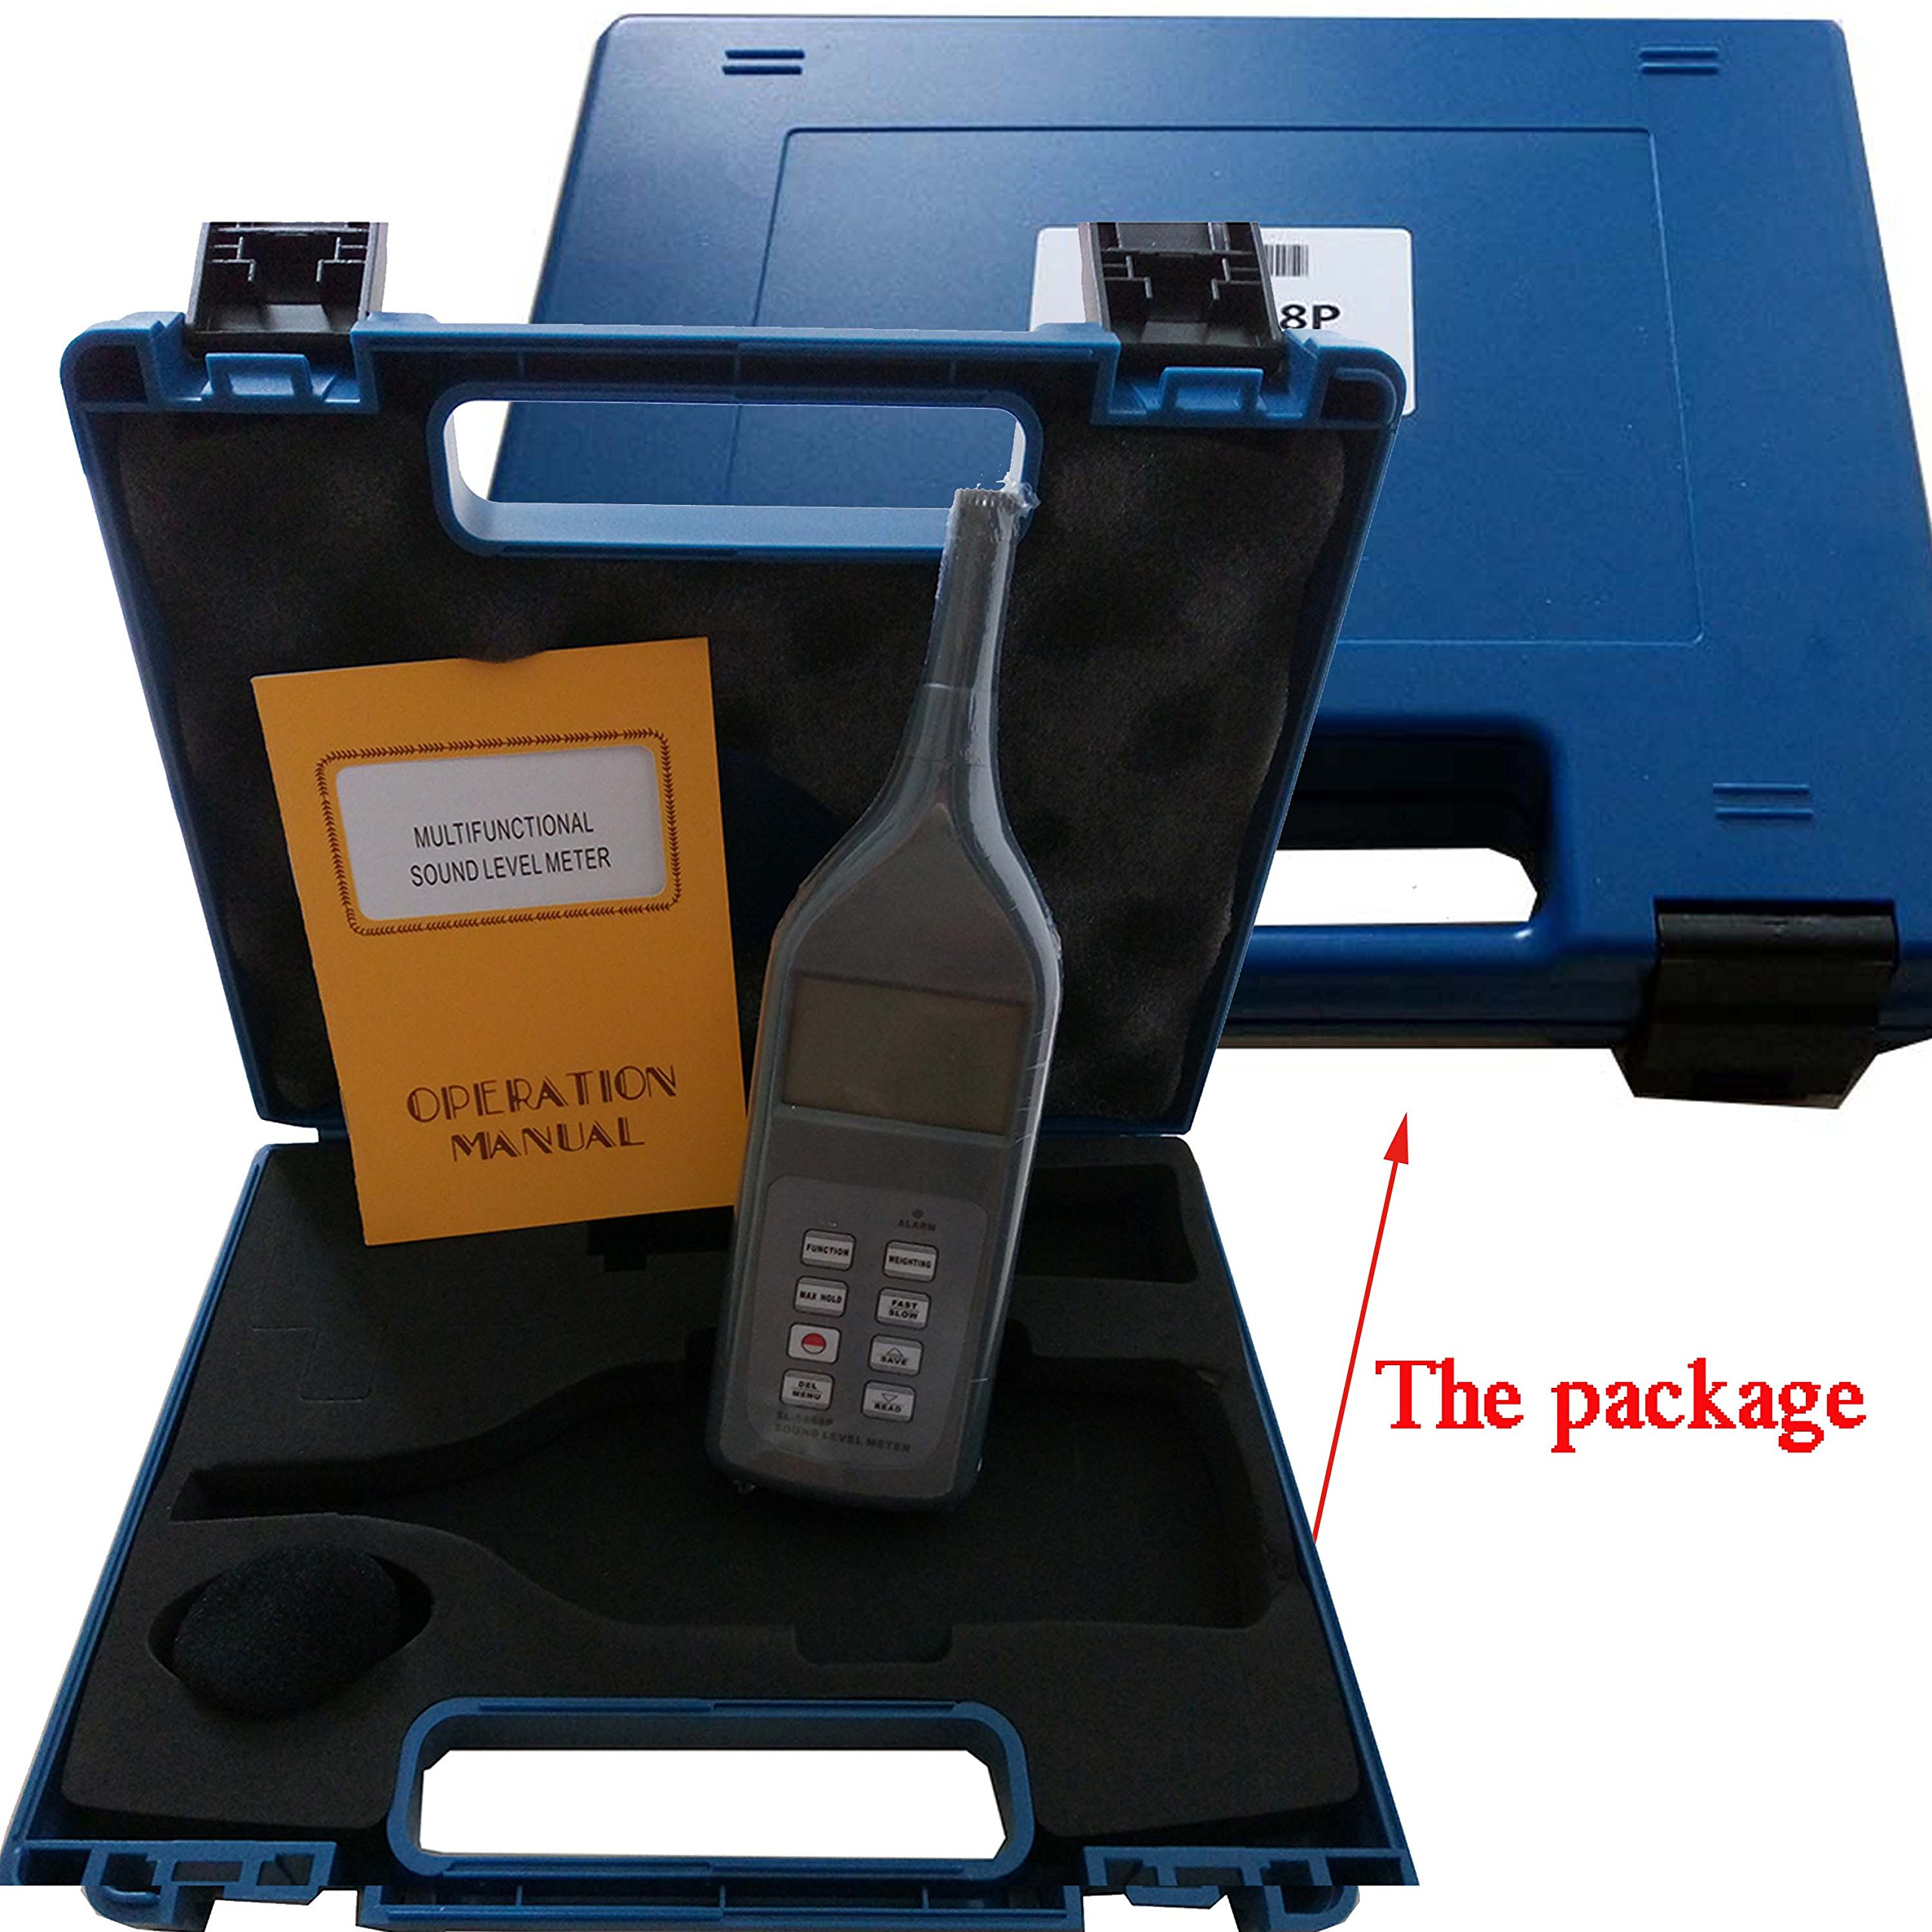 VETUS INSTRUMENTS SL-5868P Professional Digital Sound Level Meter 30 to 130db Noise decibel meter with Multifunctional Sound Level Meter Decibel Logger LCD Display Bluetooth ,Blue